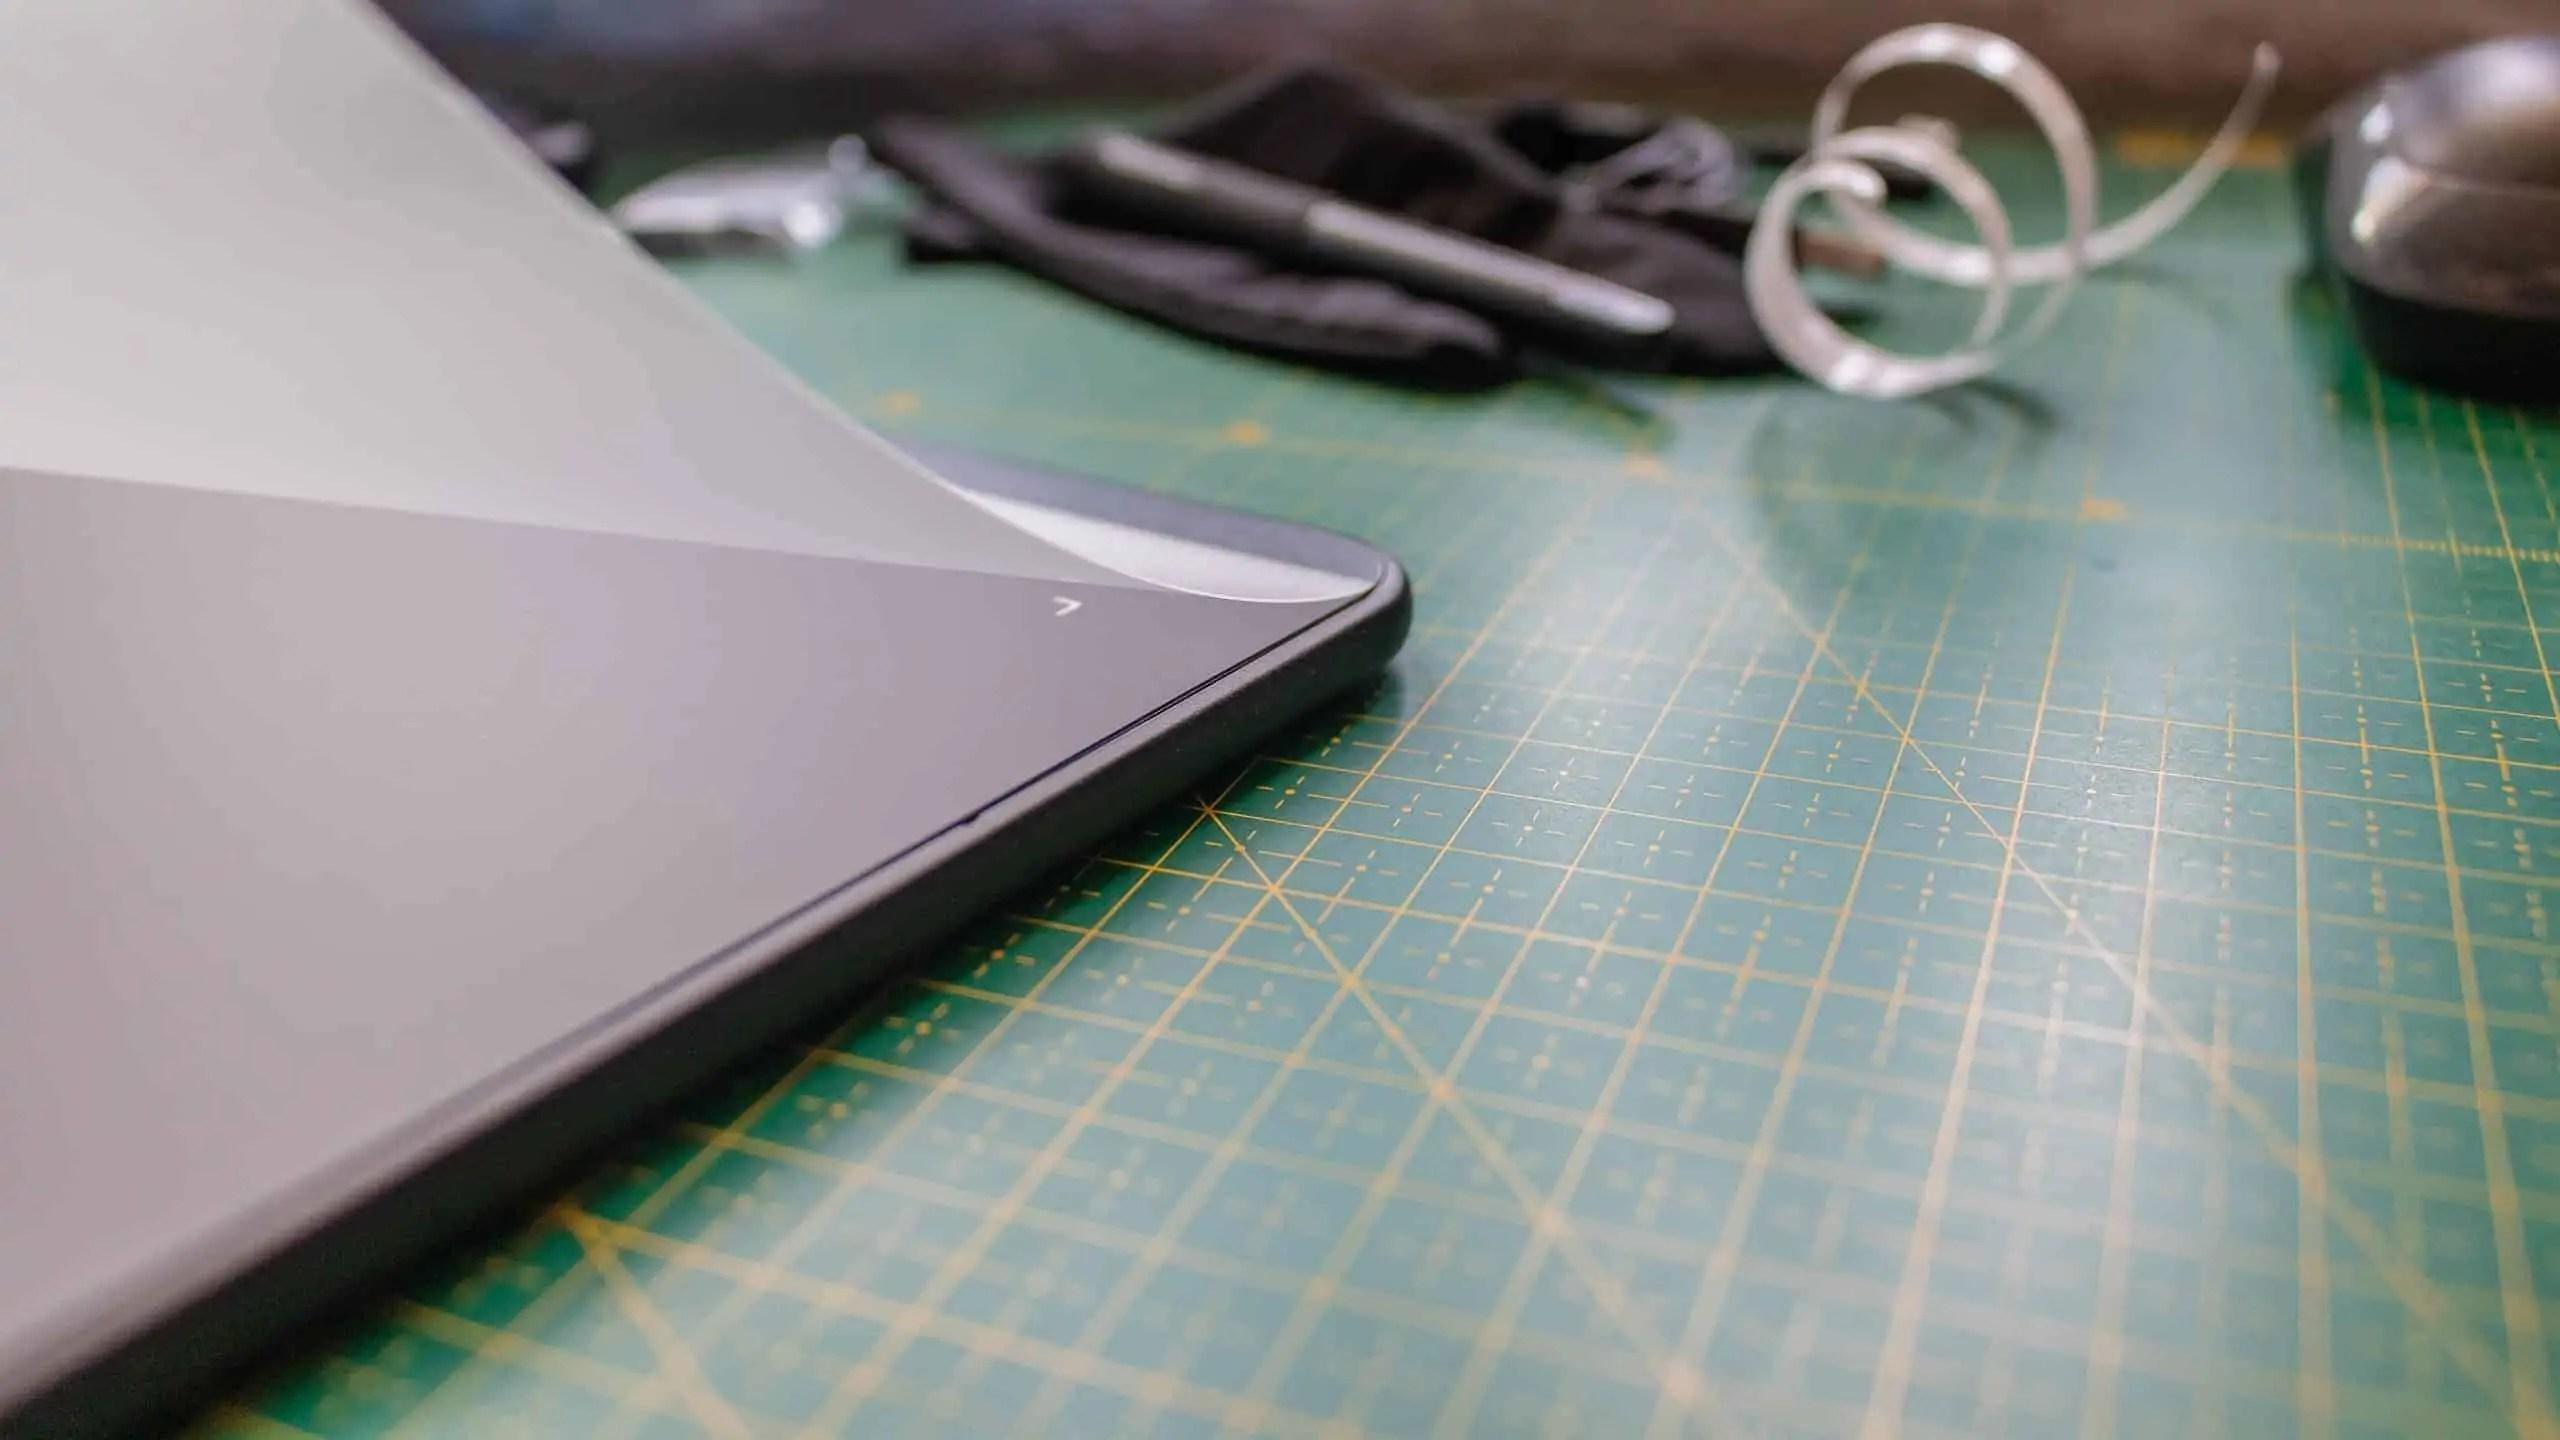 ochronna nakladka przyklejna na pasek tasmy klejacej  - Praca z tabletem graficznym XP PEN Deco 01 v2